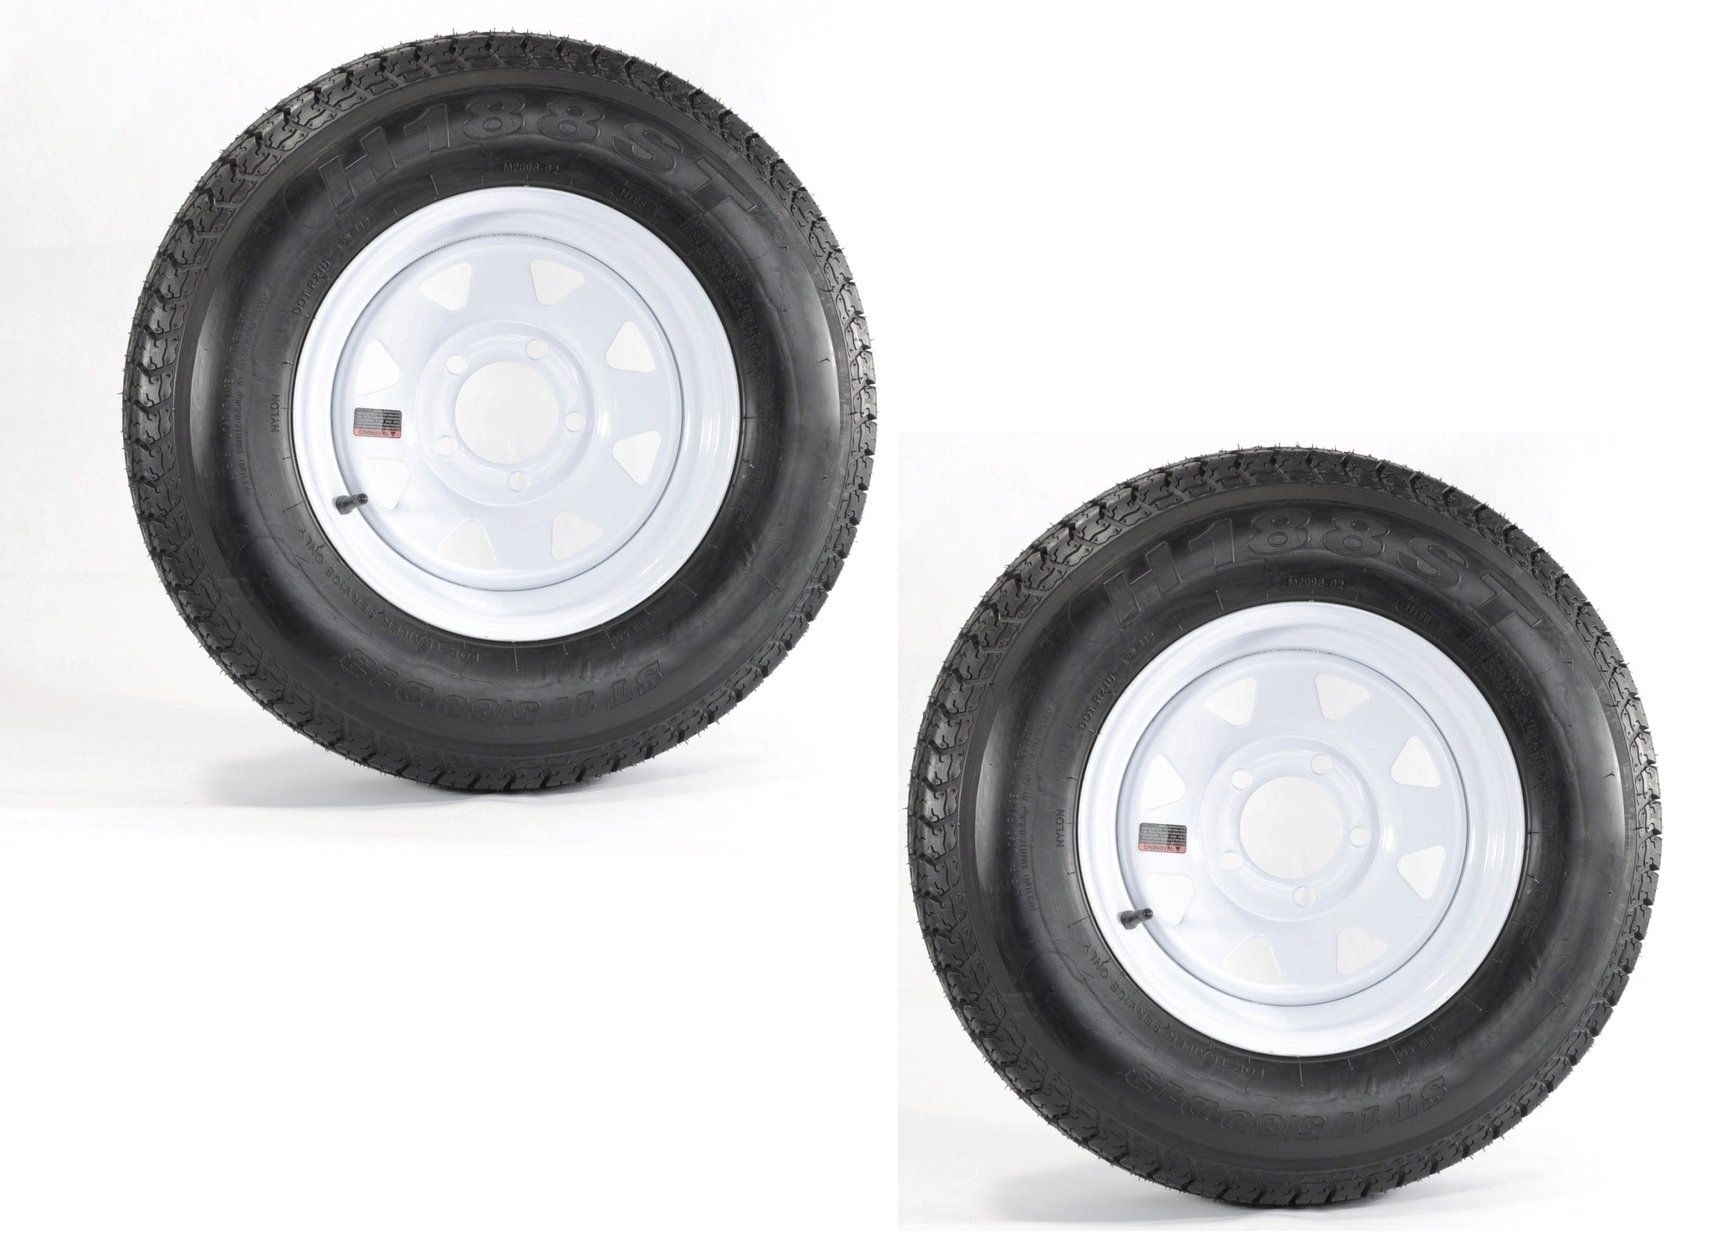 2-Pack Trailer Wheel & Tire #425 ST175/80D13 175/80 D 13'' LRC 5 Hole White Spoke